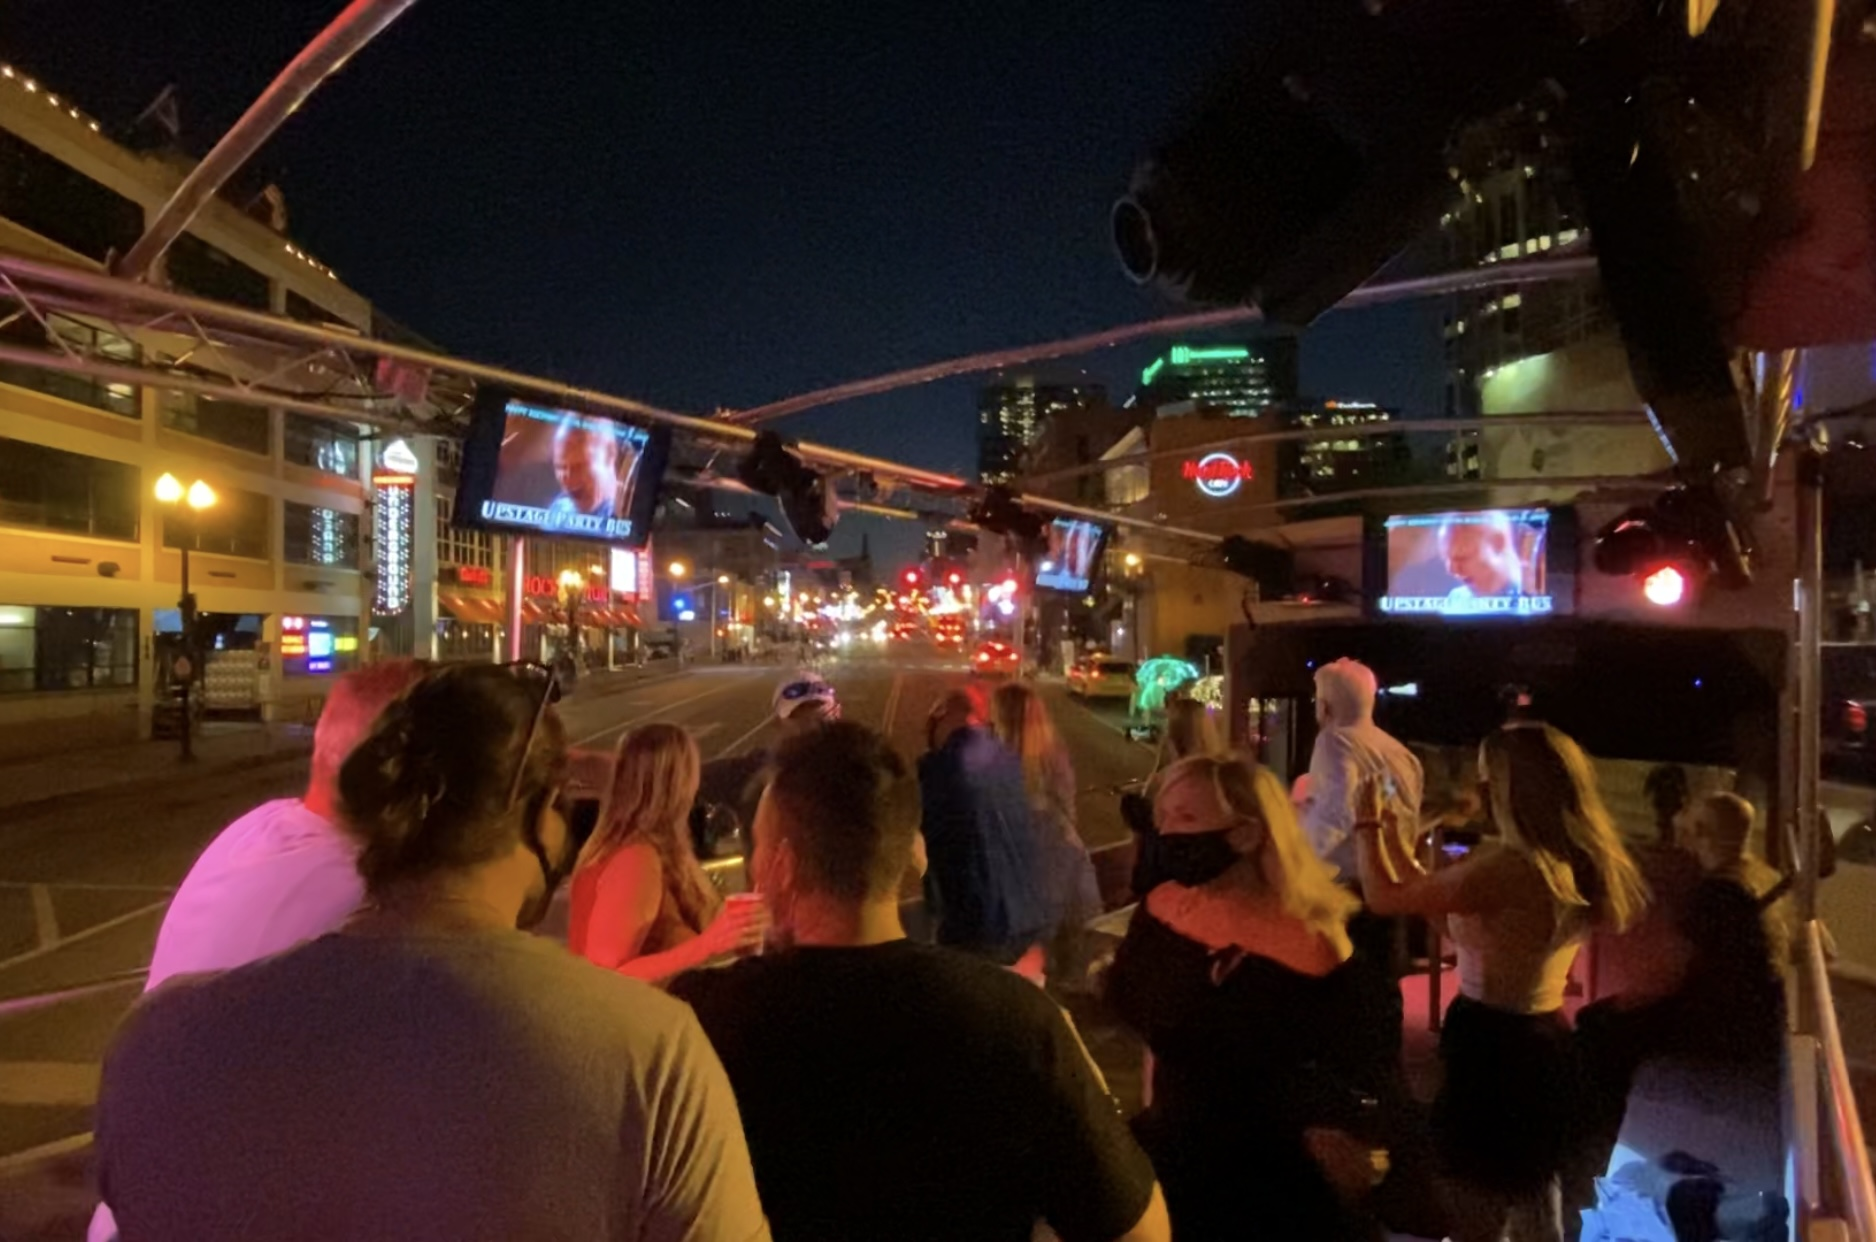 Open Air Party Bus in Nashville, TN